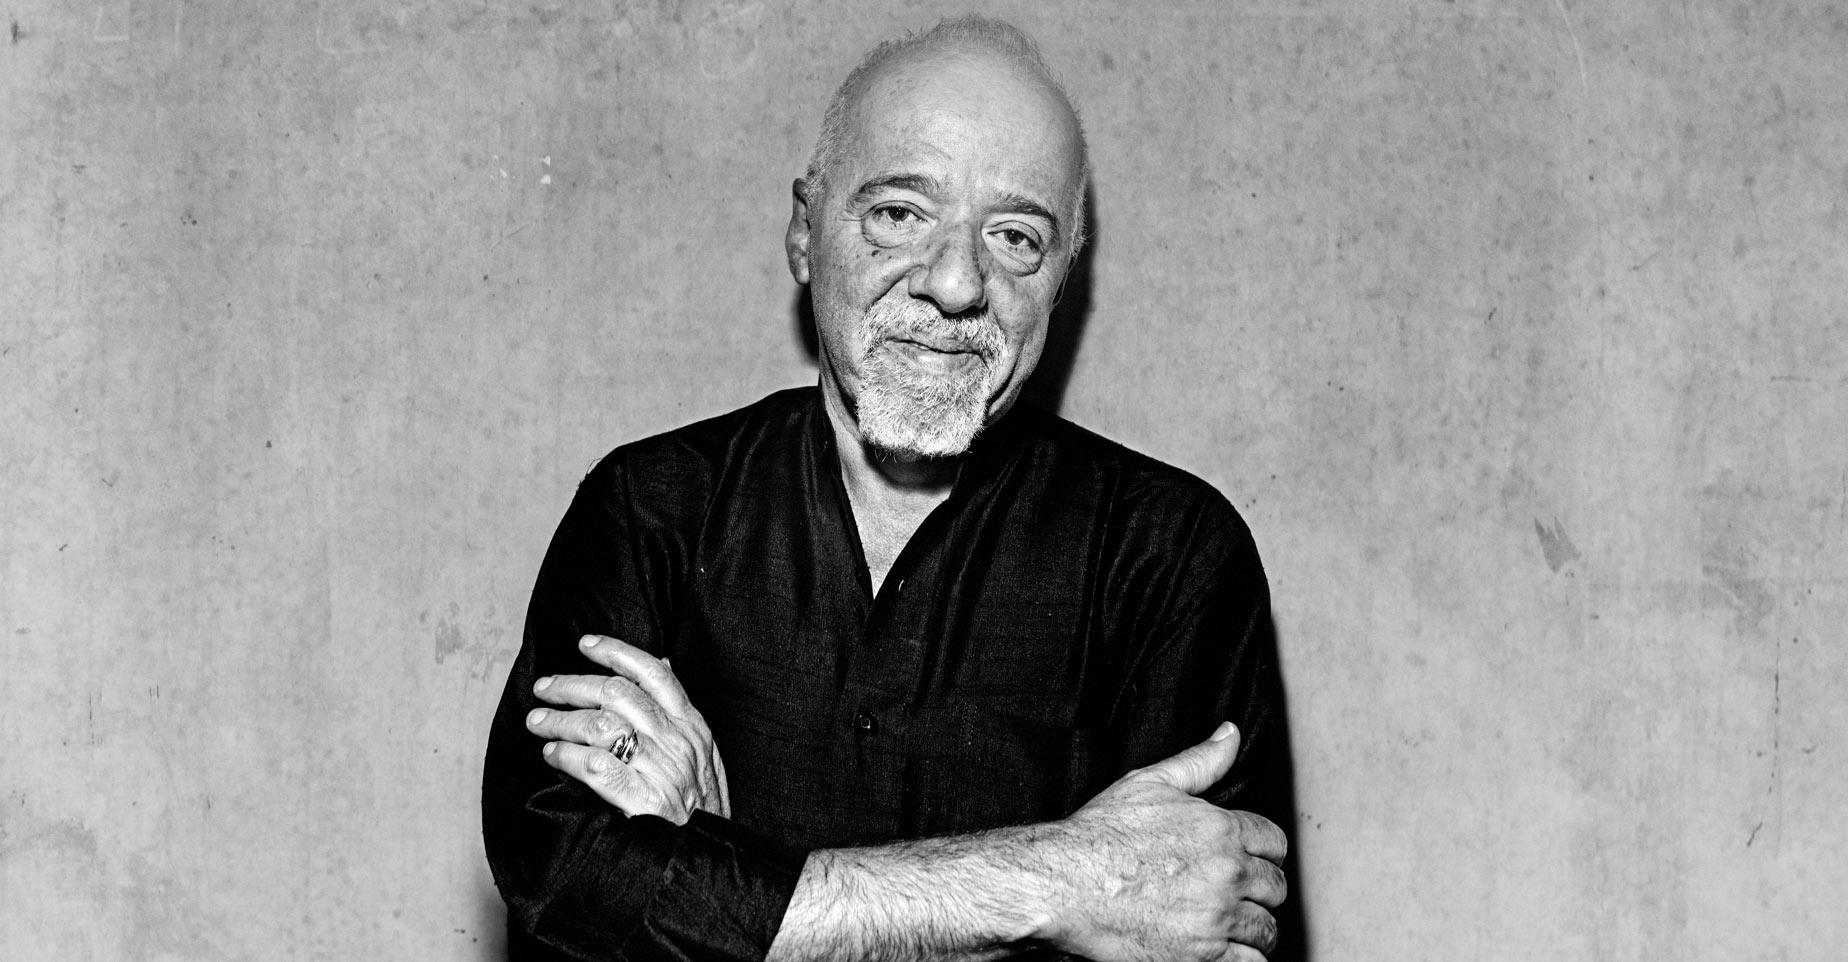 Paulo Coelho - Αυτό που ψάχνεις εσύ, σε ψάχνει επίσης